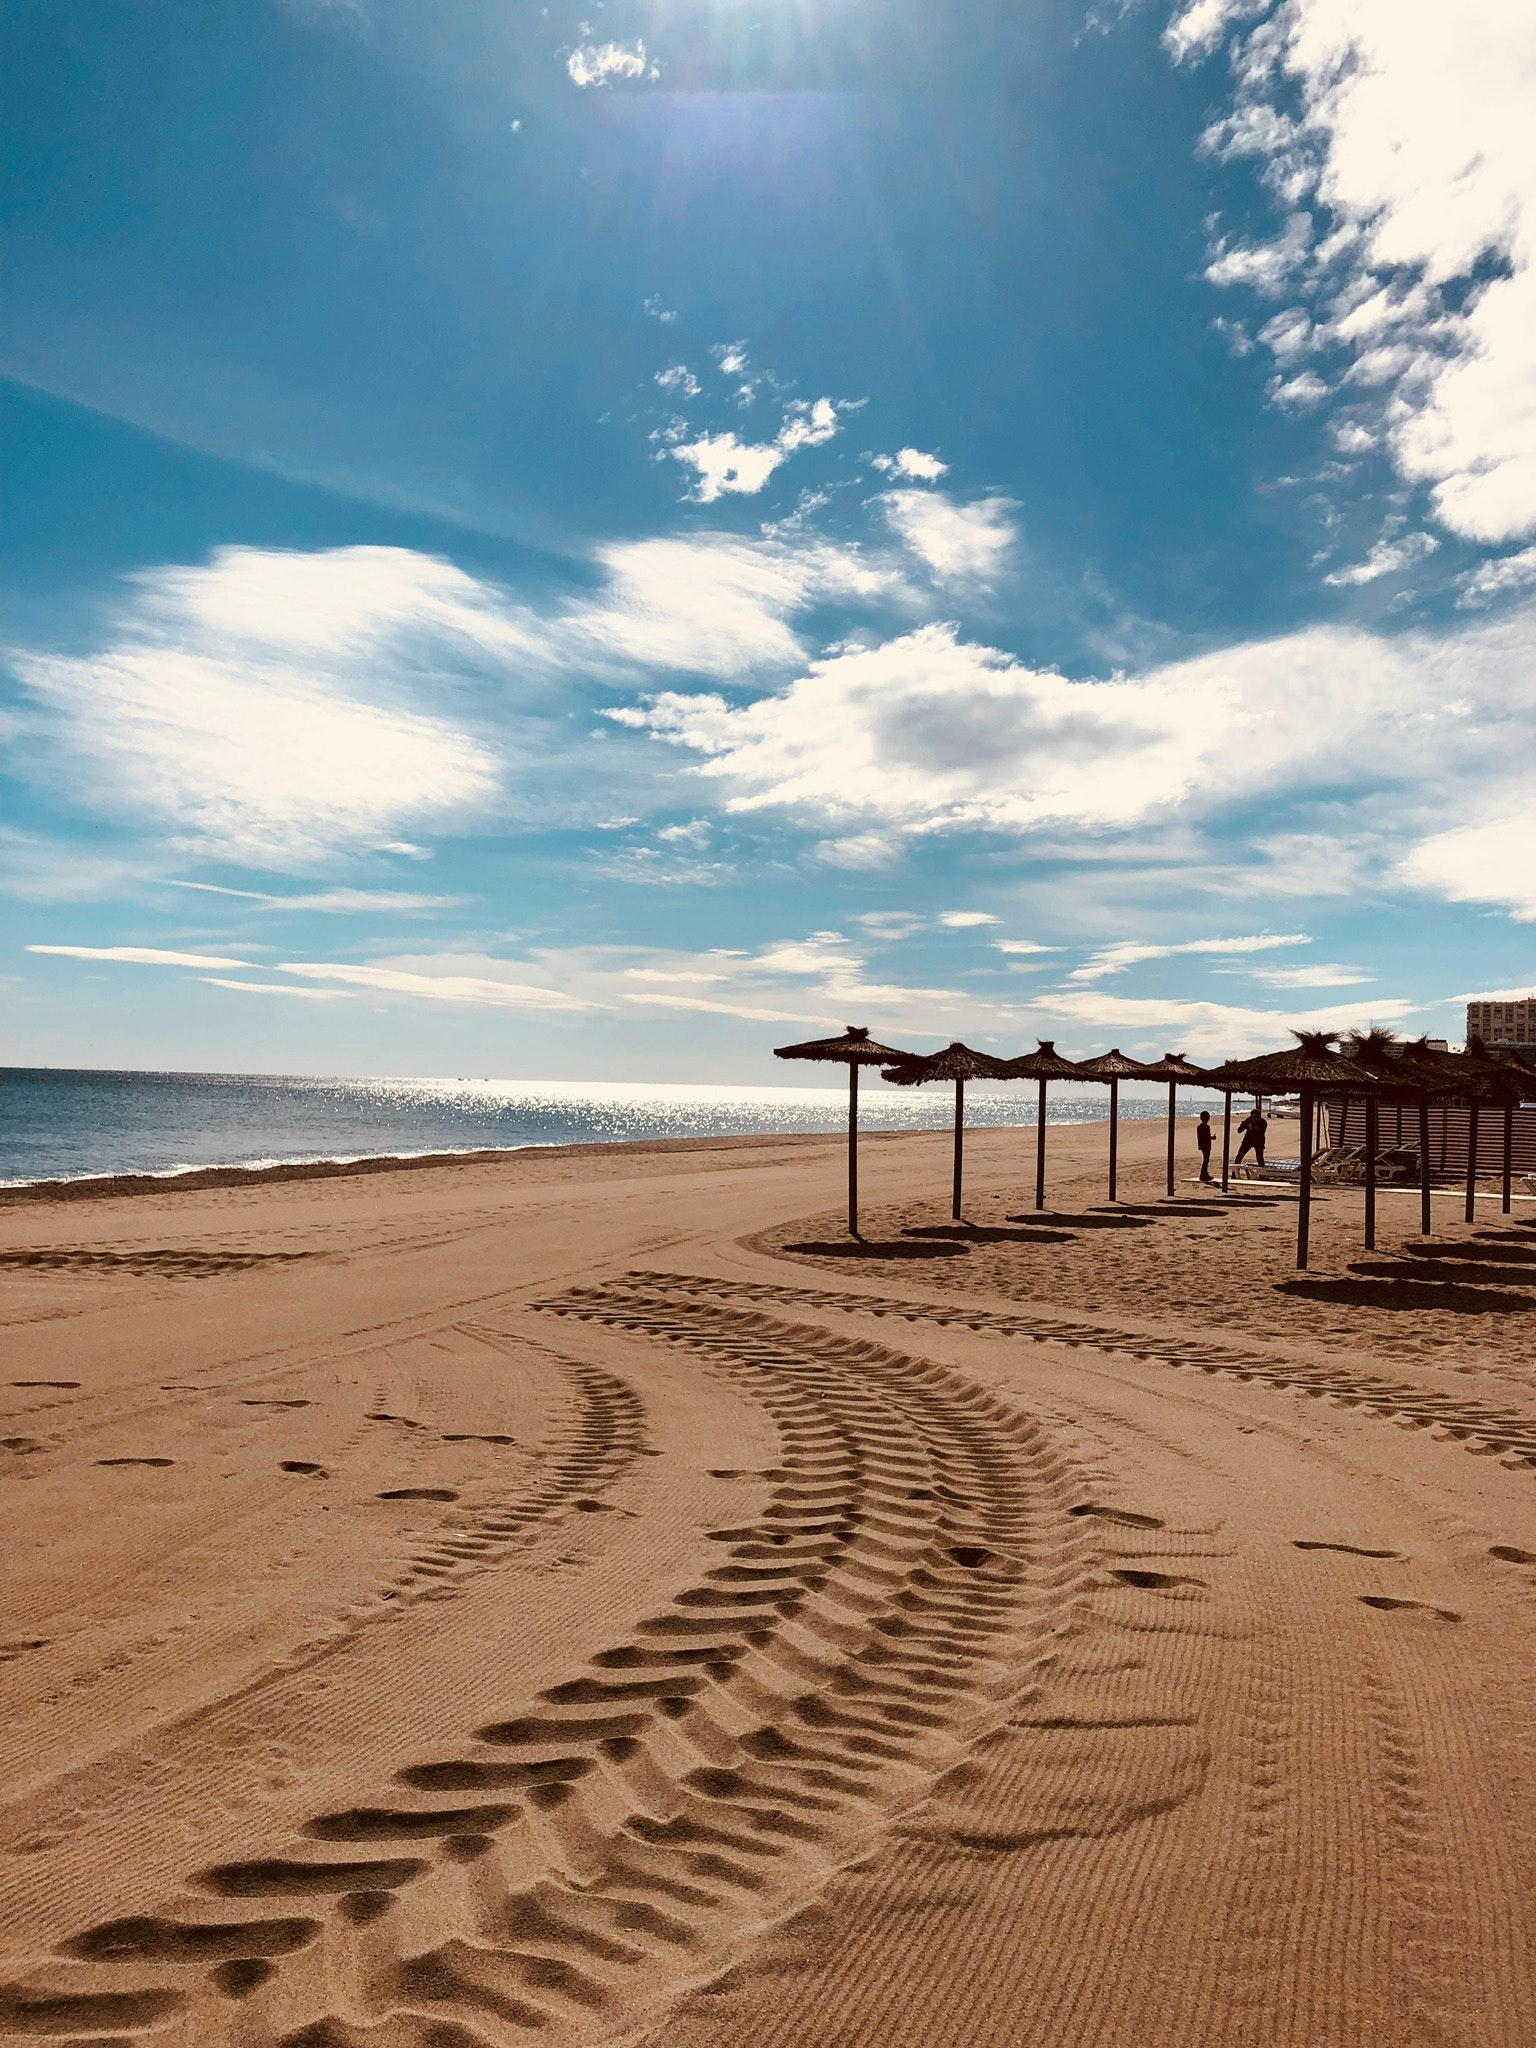 Brown Sand Near Seashore Under Cloudy Sky, Beach, Shore, Water, Vacation, HQ Photo